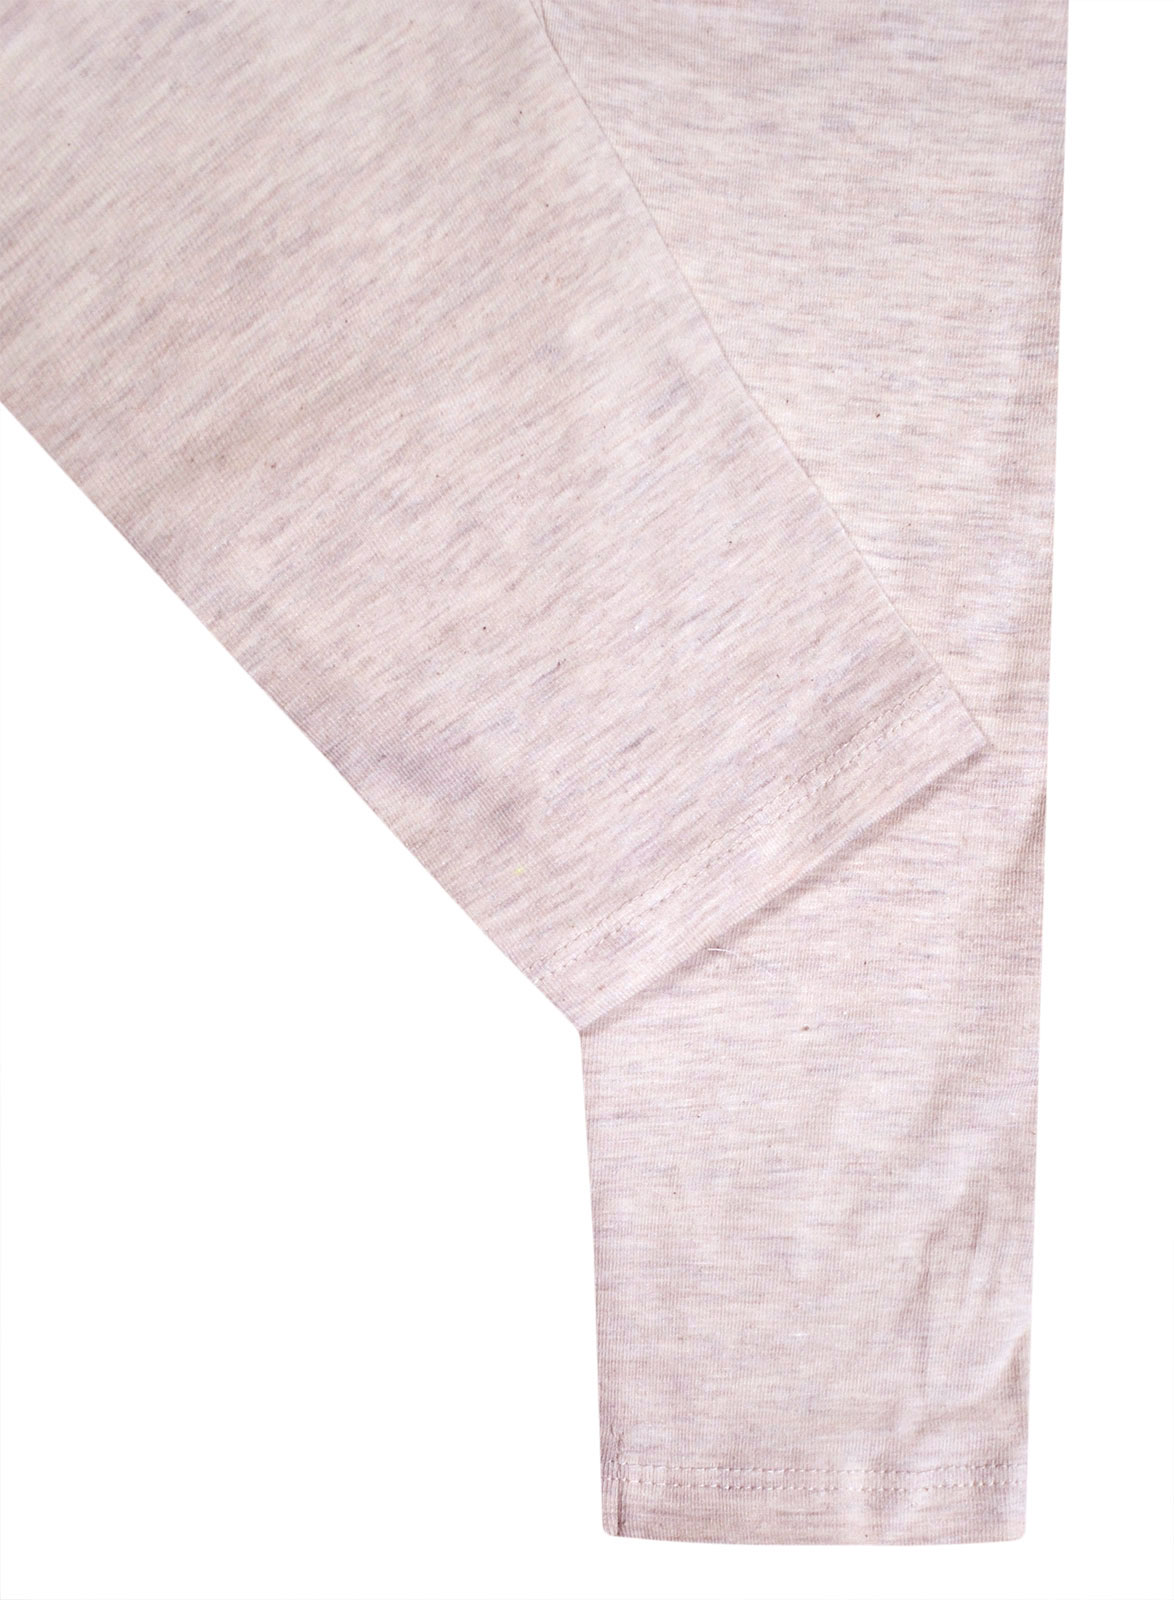 Girls-Next-Leggings-Kids-New-Pants-Age-2-3-4-5-6-7-8-9-10-11-12-13-14-15-16-Yrs thumbnail 44